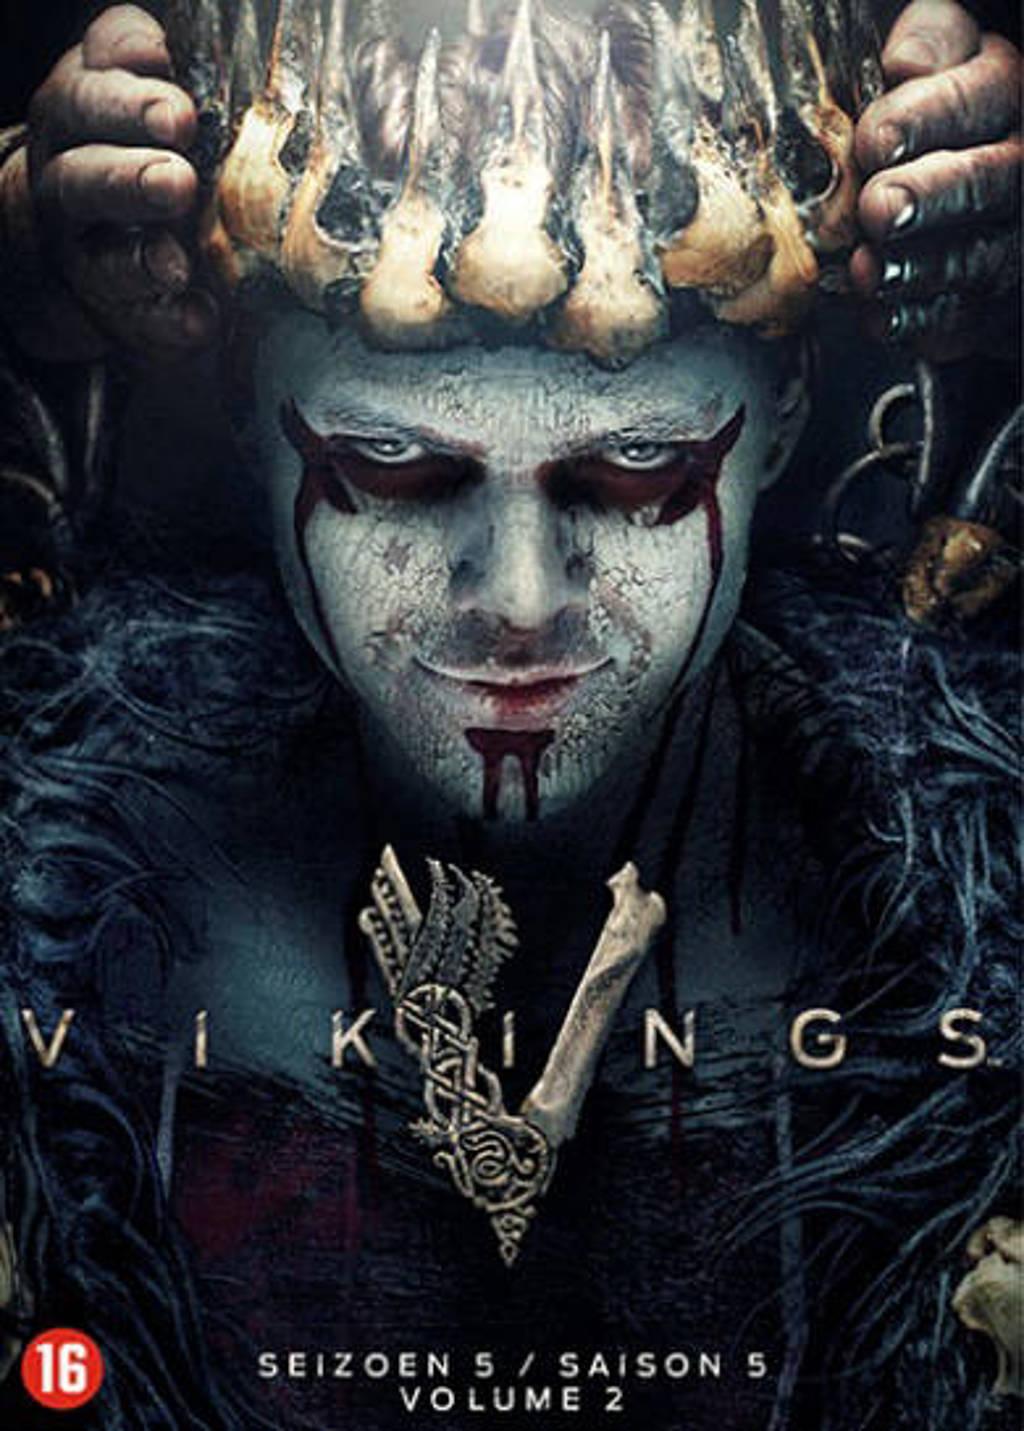 Vikings - Seizoen 5 deel 2 (DVD)